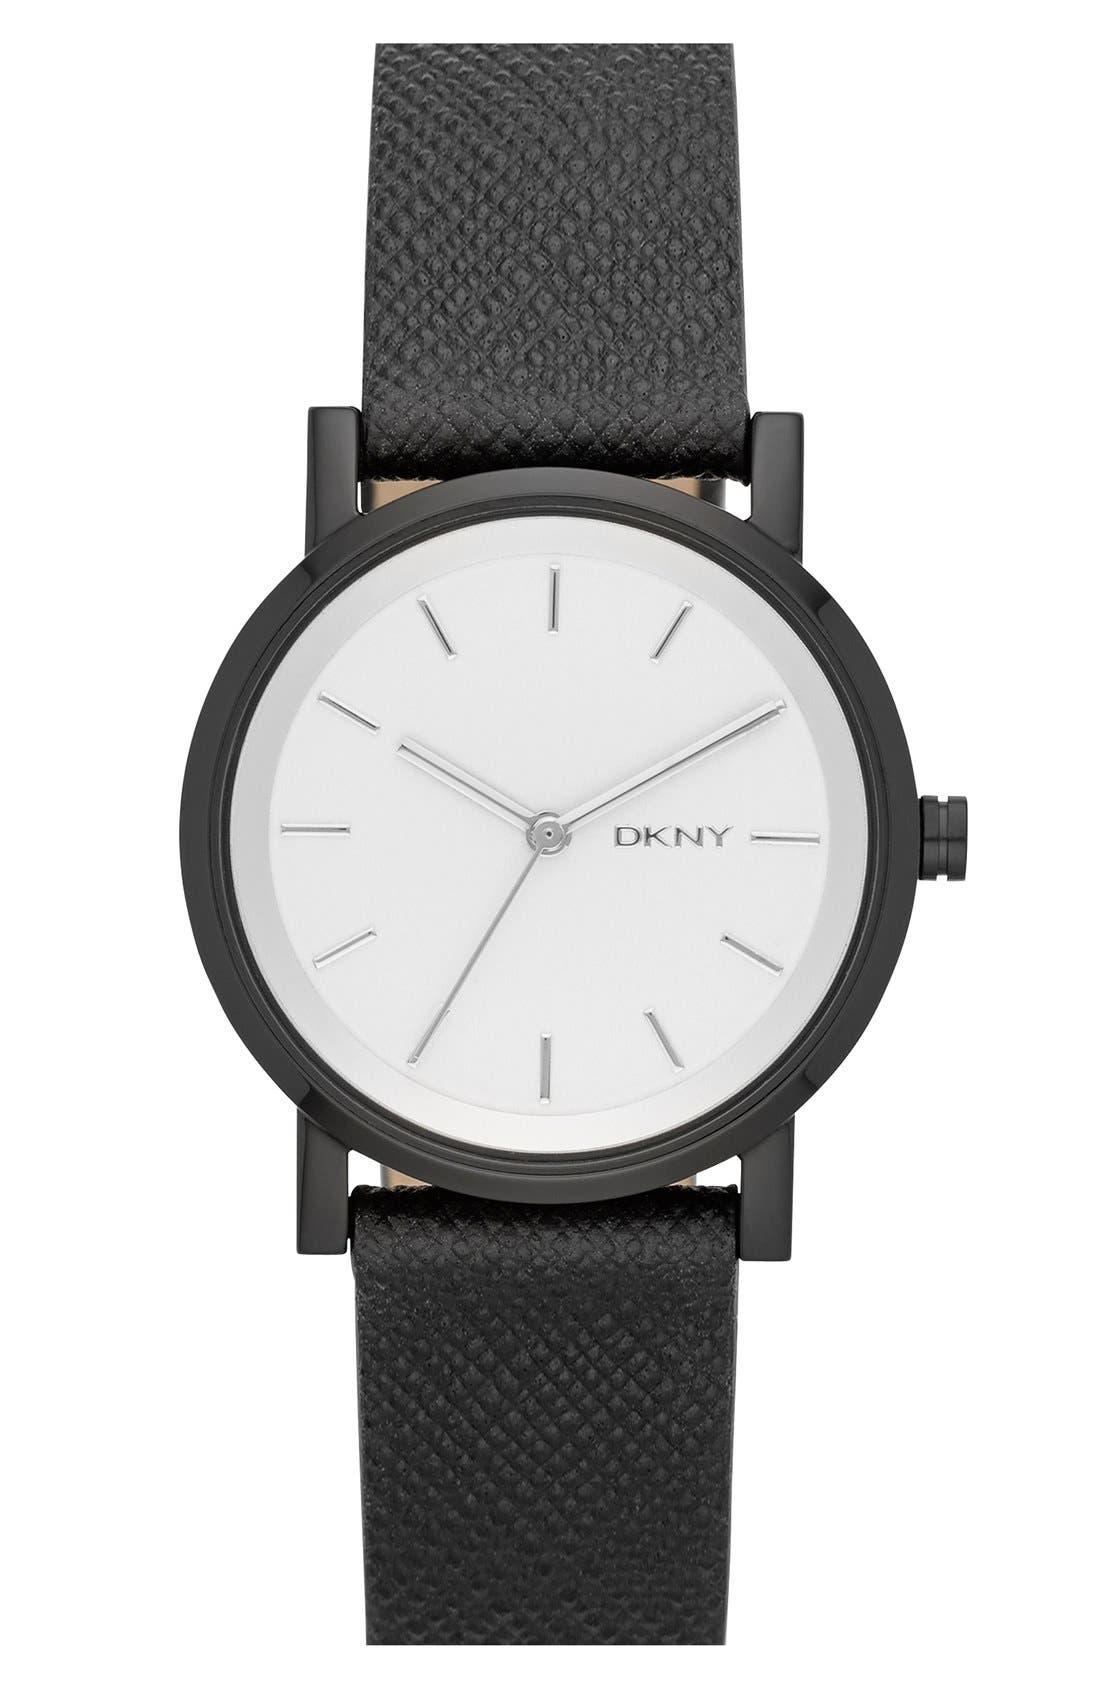 Main Image - DKNY 'Soho' Round Leather Strap Watch, 34mm